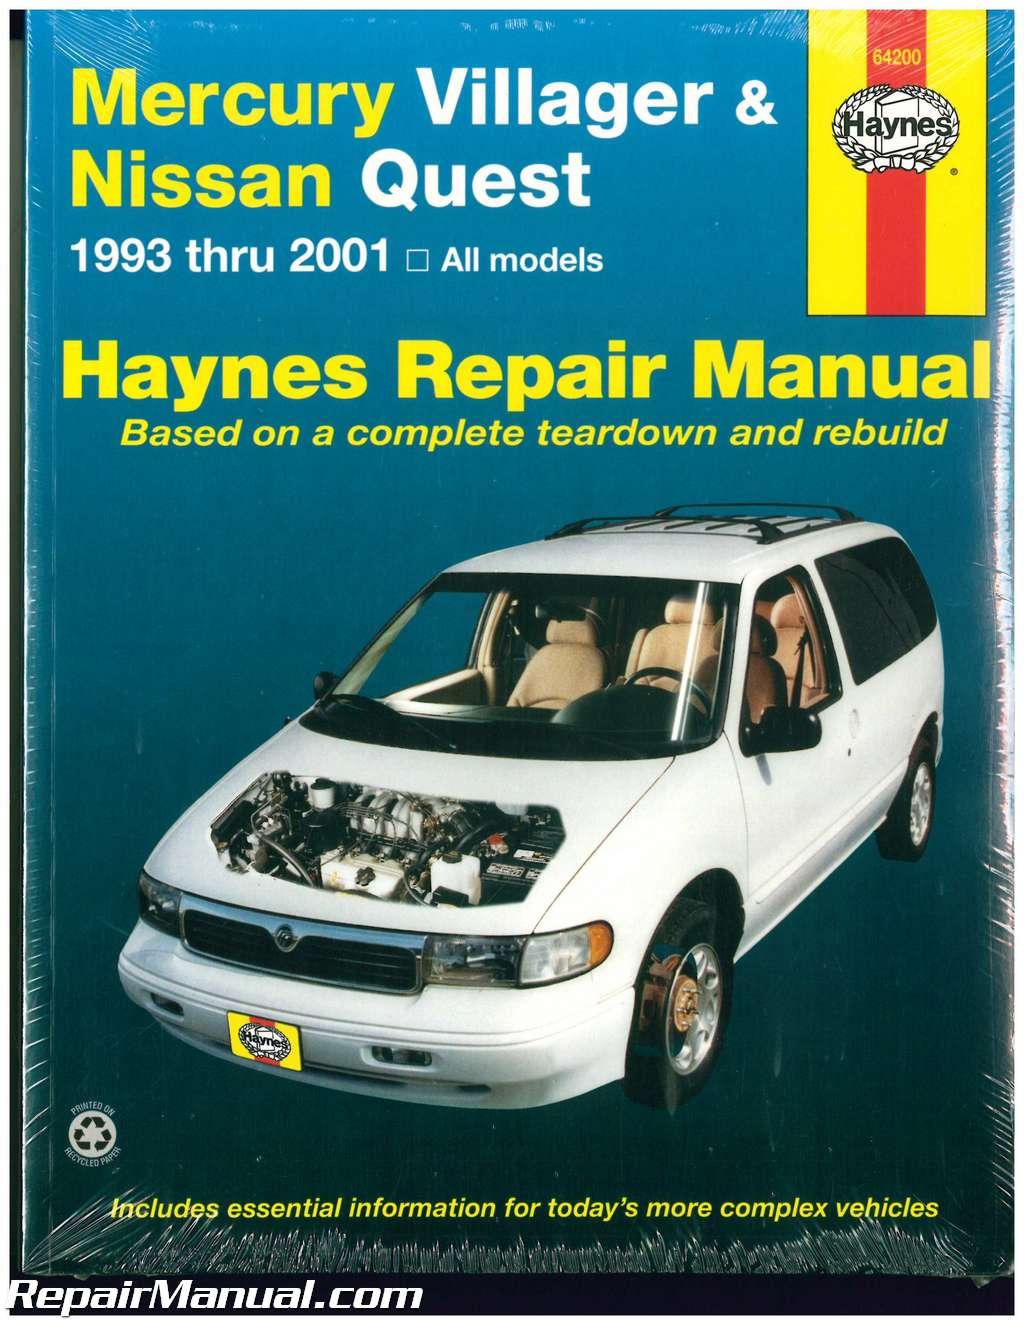 Haynes Mercury Villager Nissan Quest 1993 2001 Auto Repair Manual